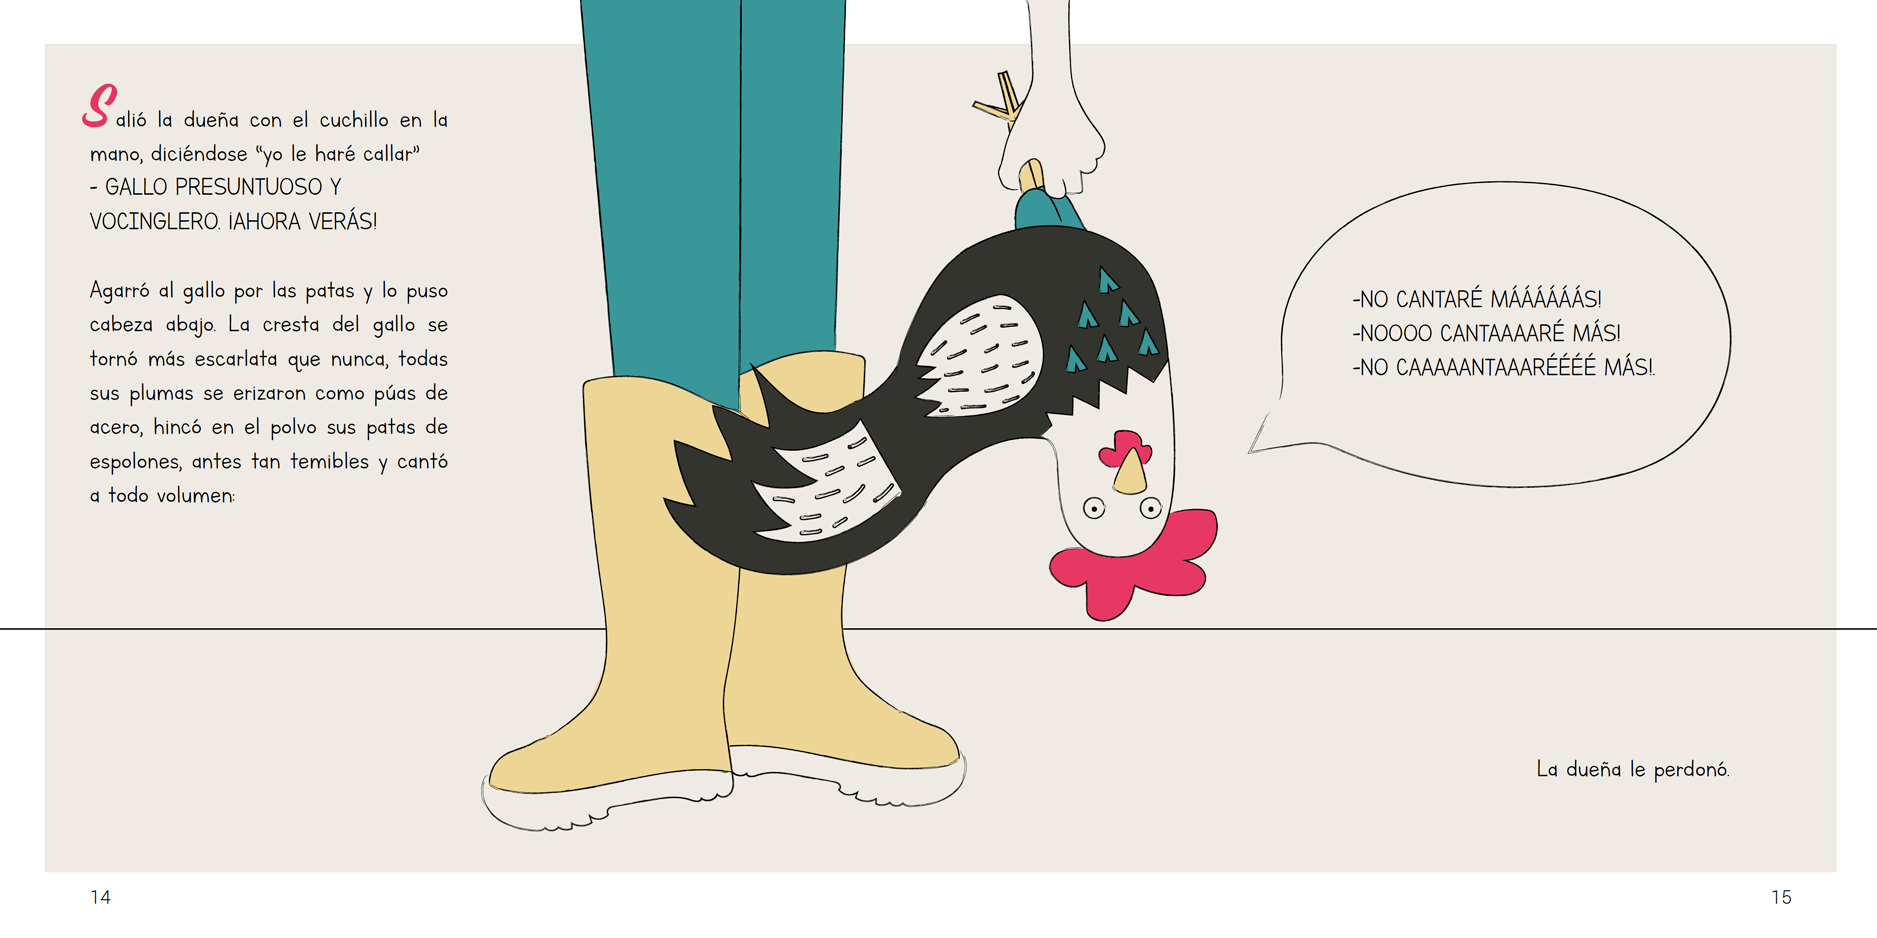 el gallo cantor graphic design tale angels pinyol editorial llibre infantil illustration vilafranca penedes disseny - EL GALLO CANTOR - Disseny Editorial i Il·lustracions Llibre Infantil